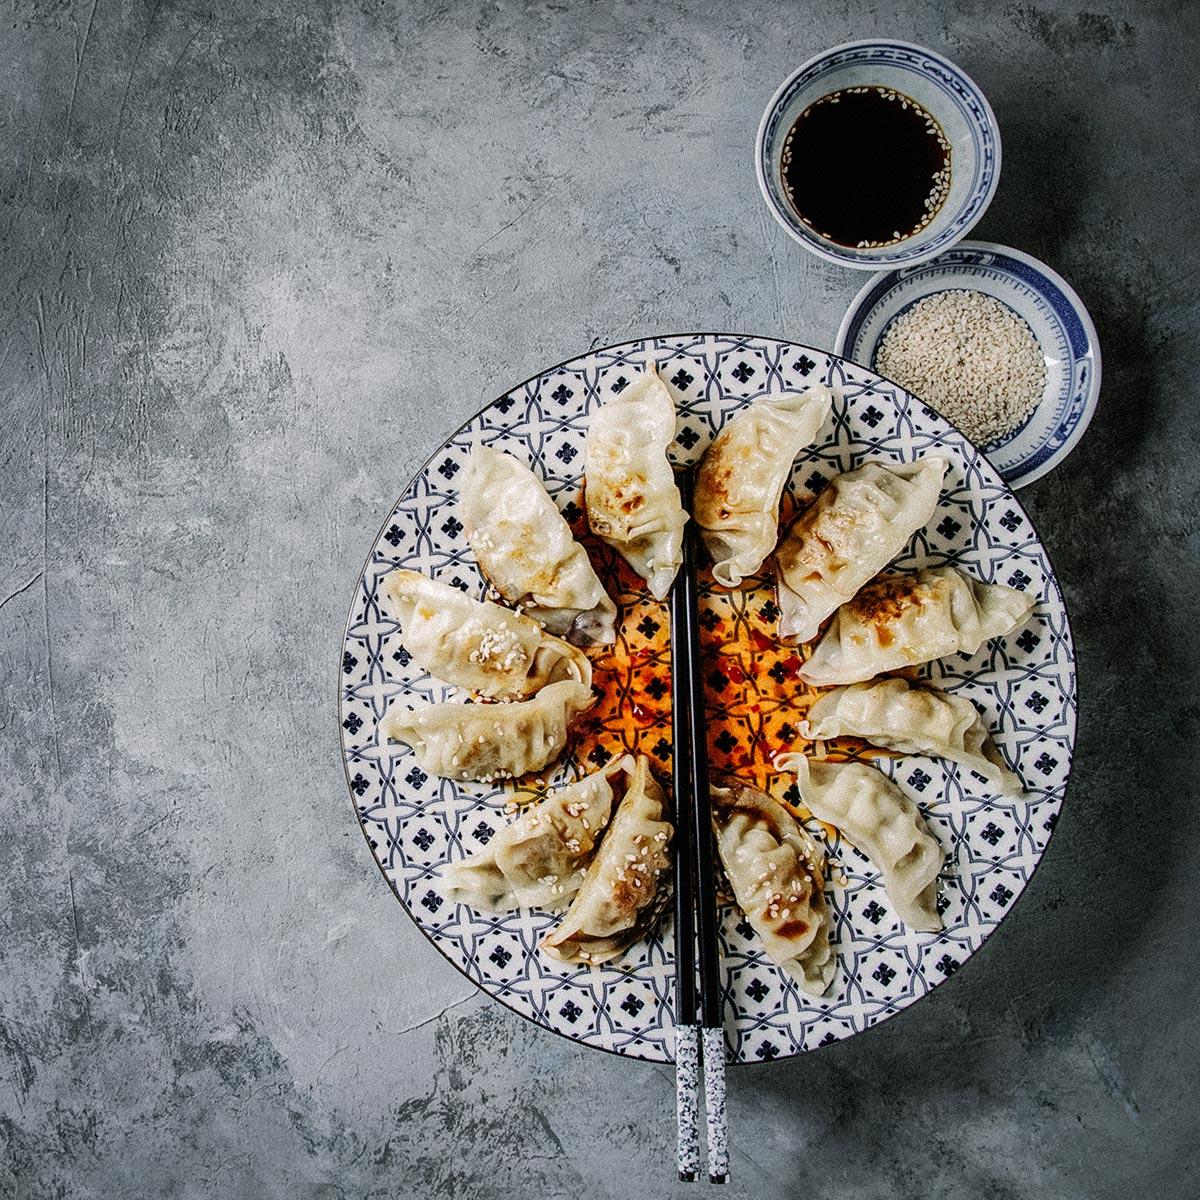 botanical-folk-homemade-gyoza-dumplings-seasonal-vegetable-stuffing.jpg